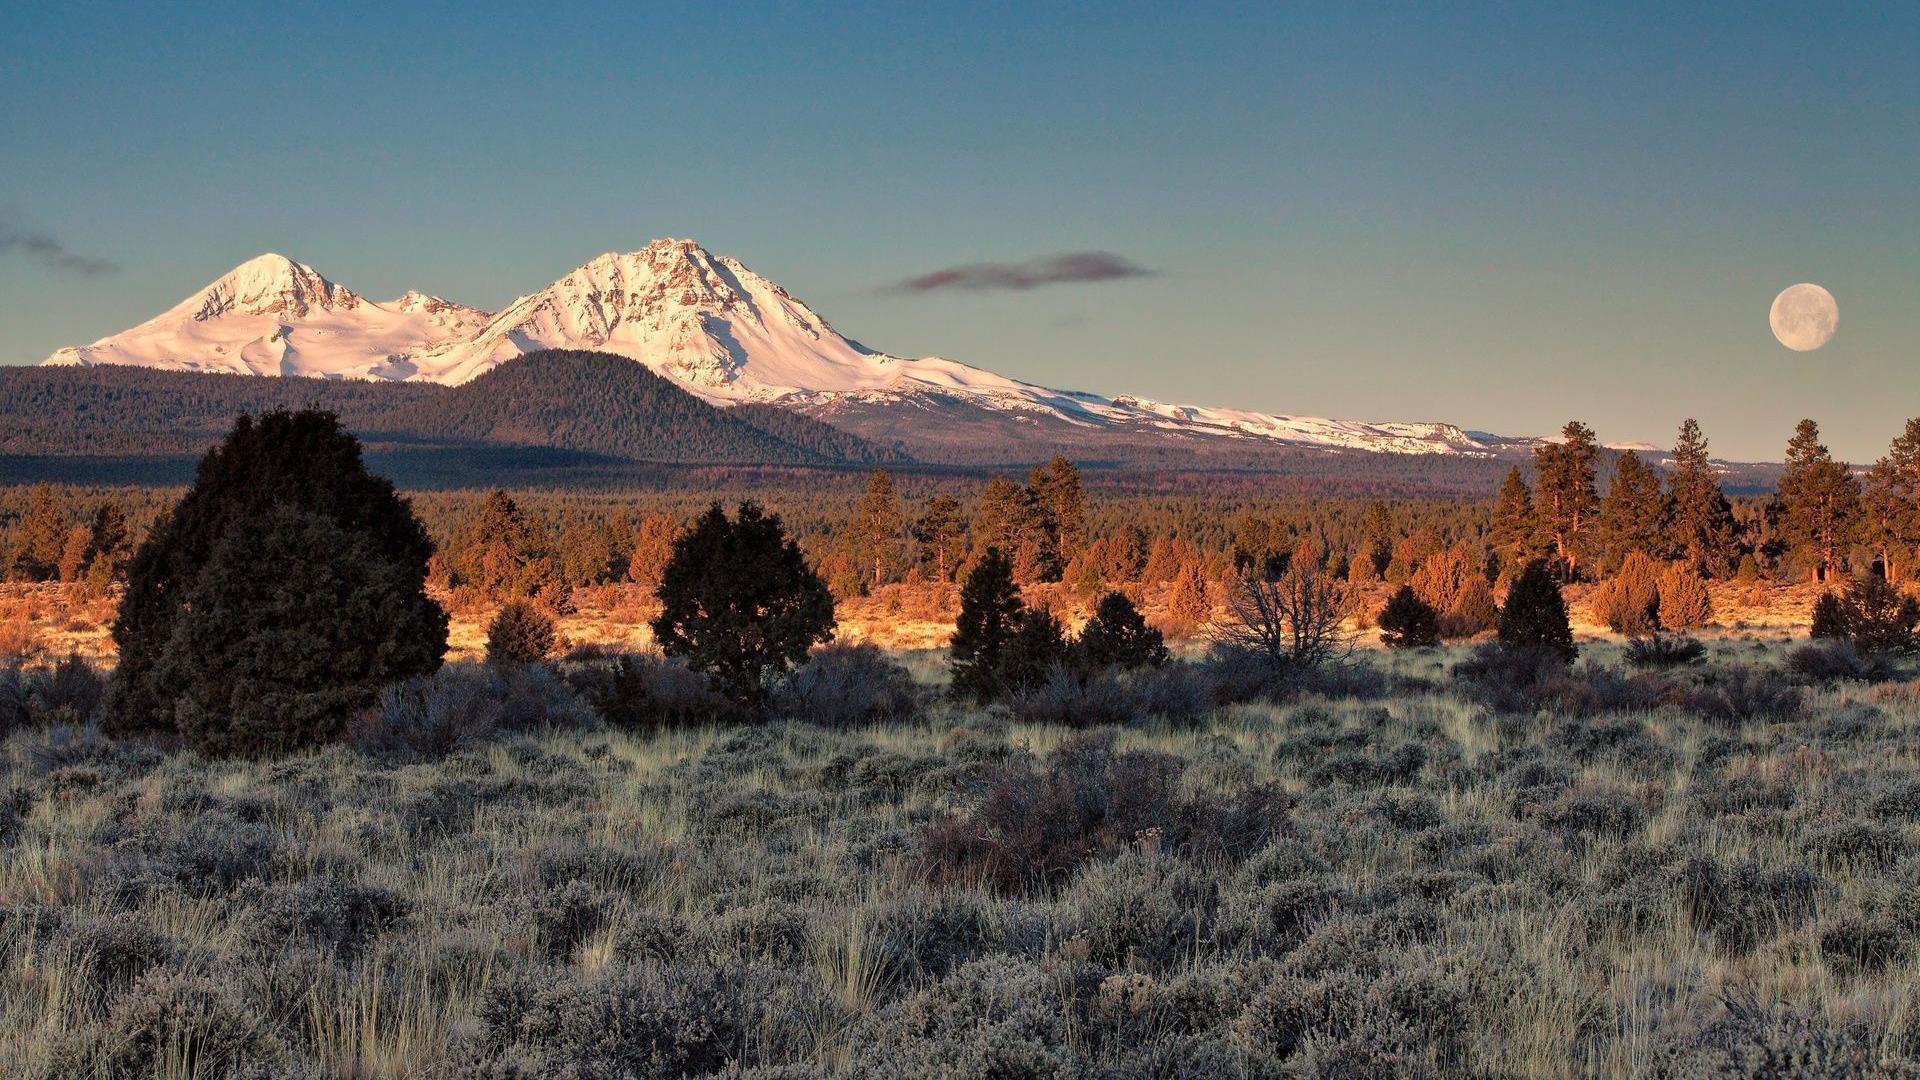 moon-over-desert-mountains-in-winter-299